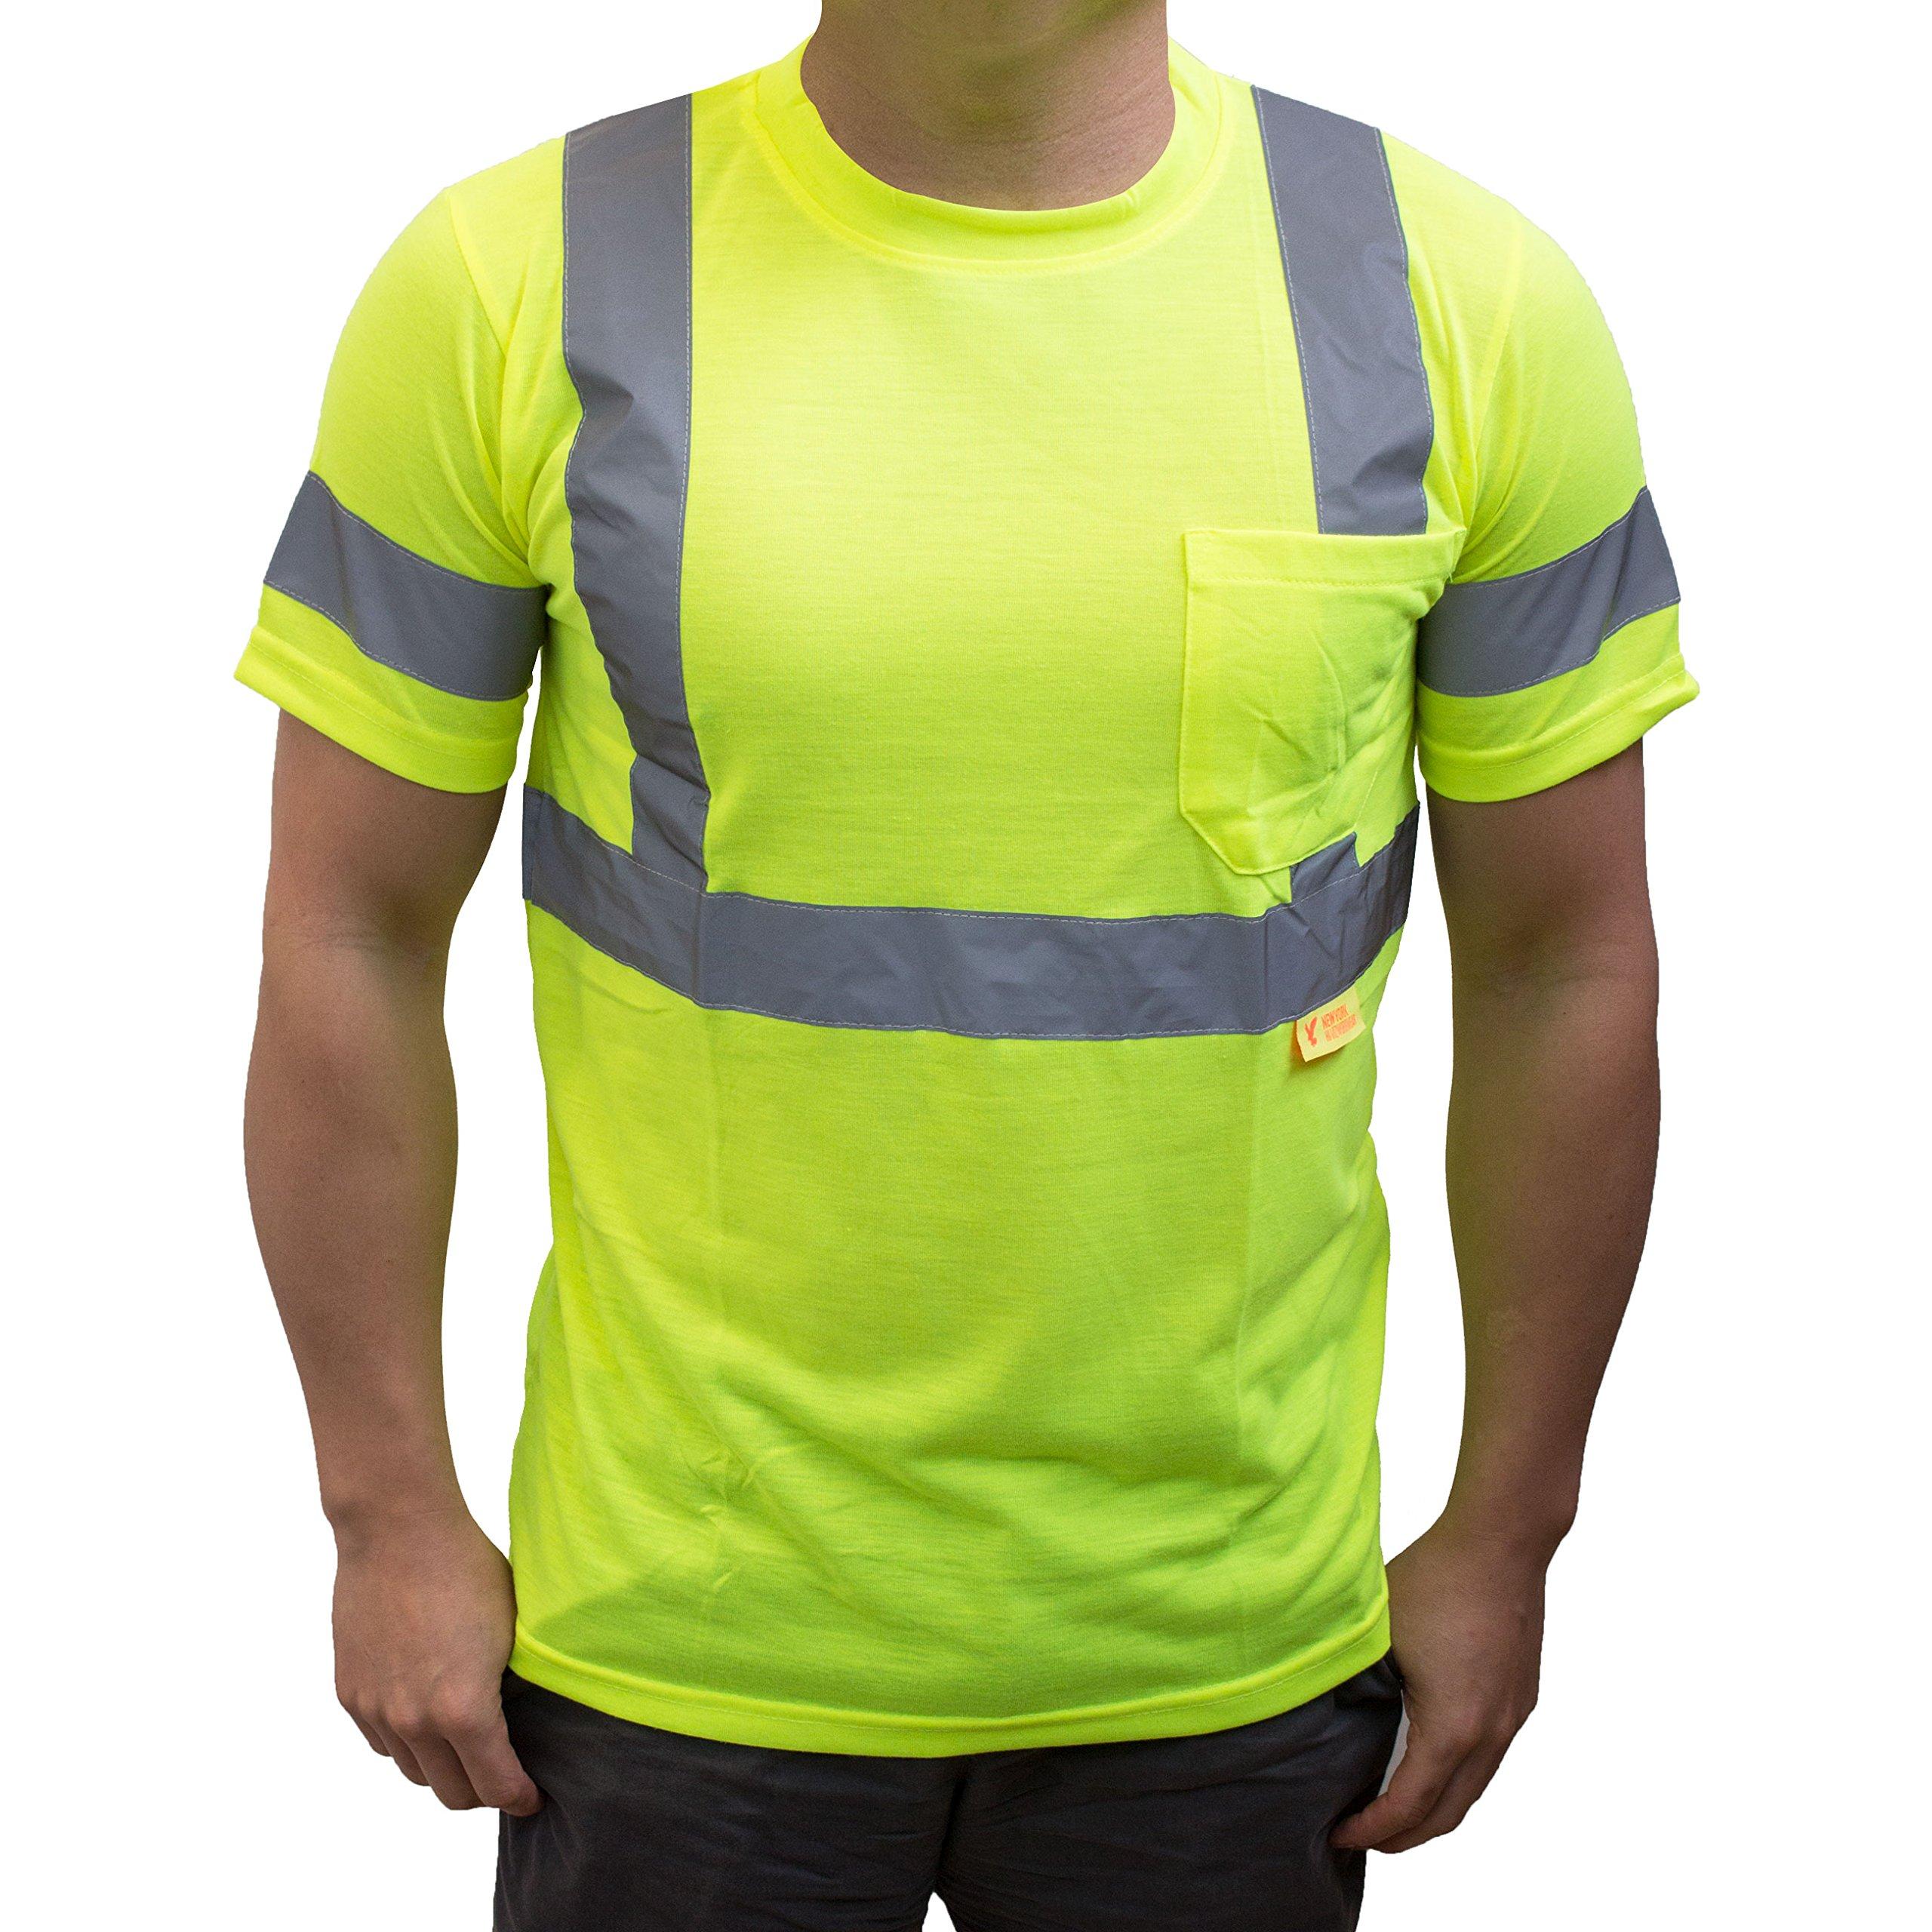 NY Hi-Viz Workwear 9082 Class 3 High Vis Reflective Short Sleeve ANSI Safety Shirt (Medium, Lime)